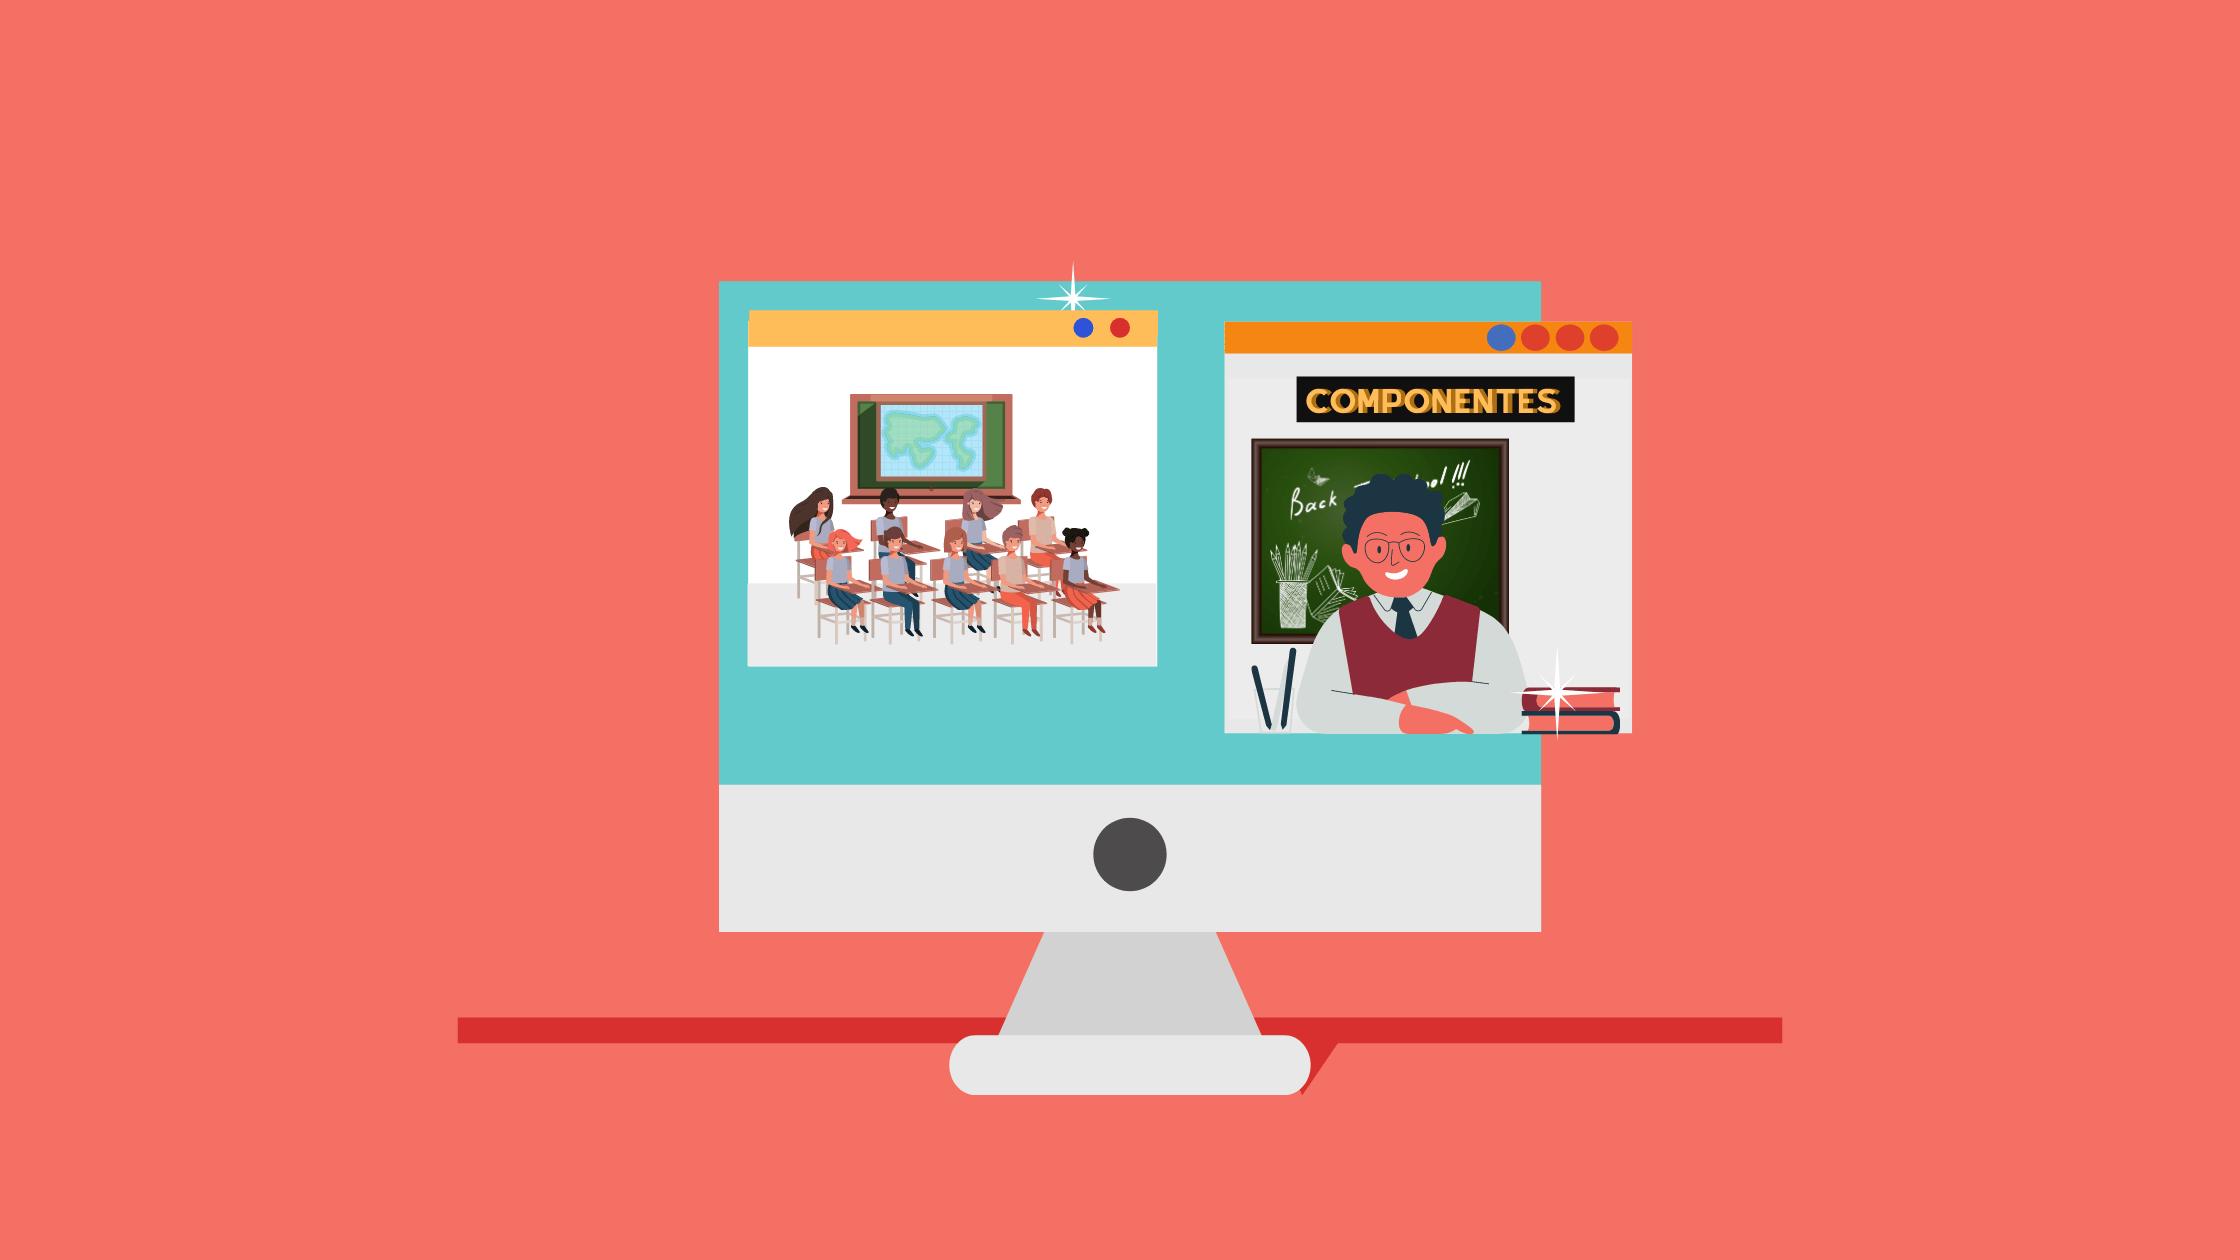 componentes de e-learning